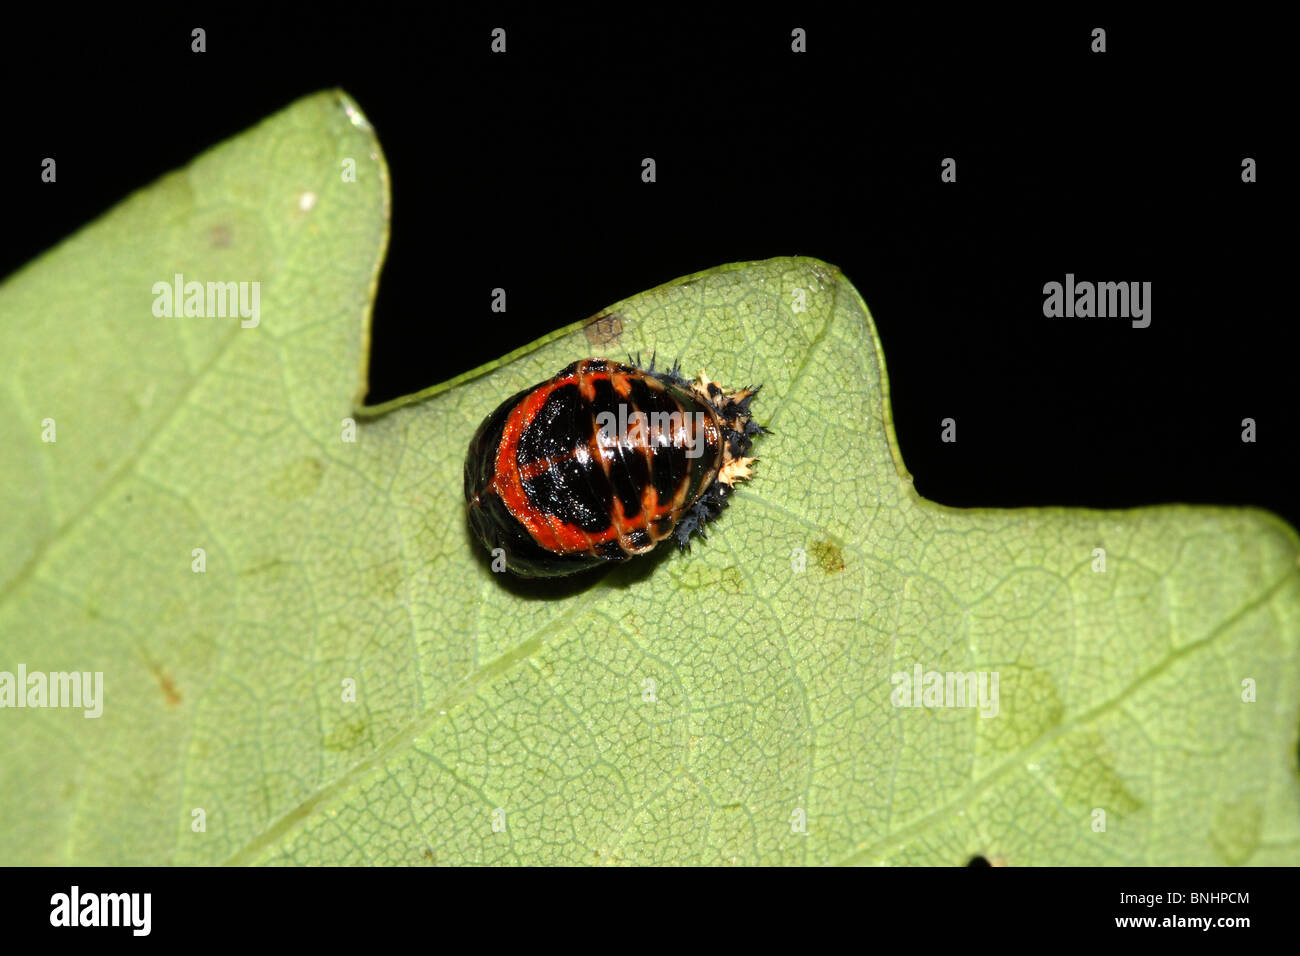 Harlequinn Asian Ladybird Larvae - Stock Image